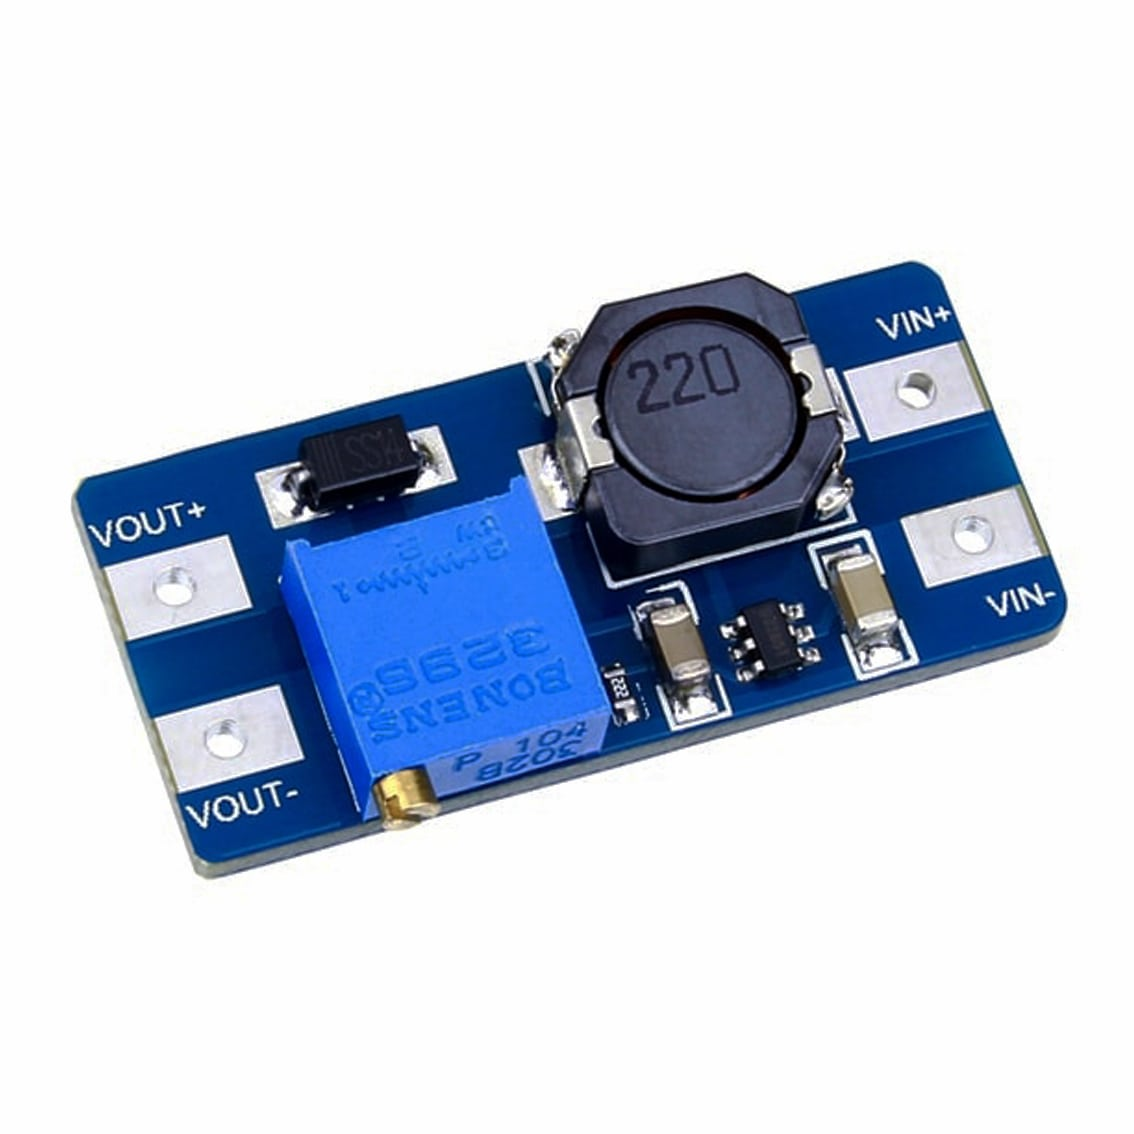 Mt3608 Step Up Adjustable Dc Switching Power Module Boost Stepupconvertercircuitjpg Converter